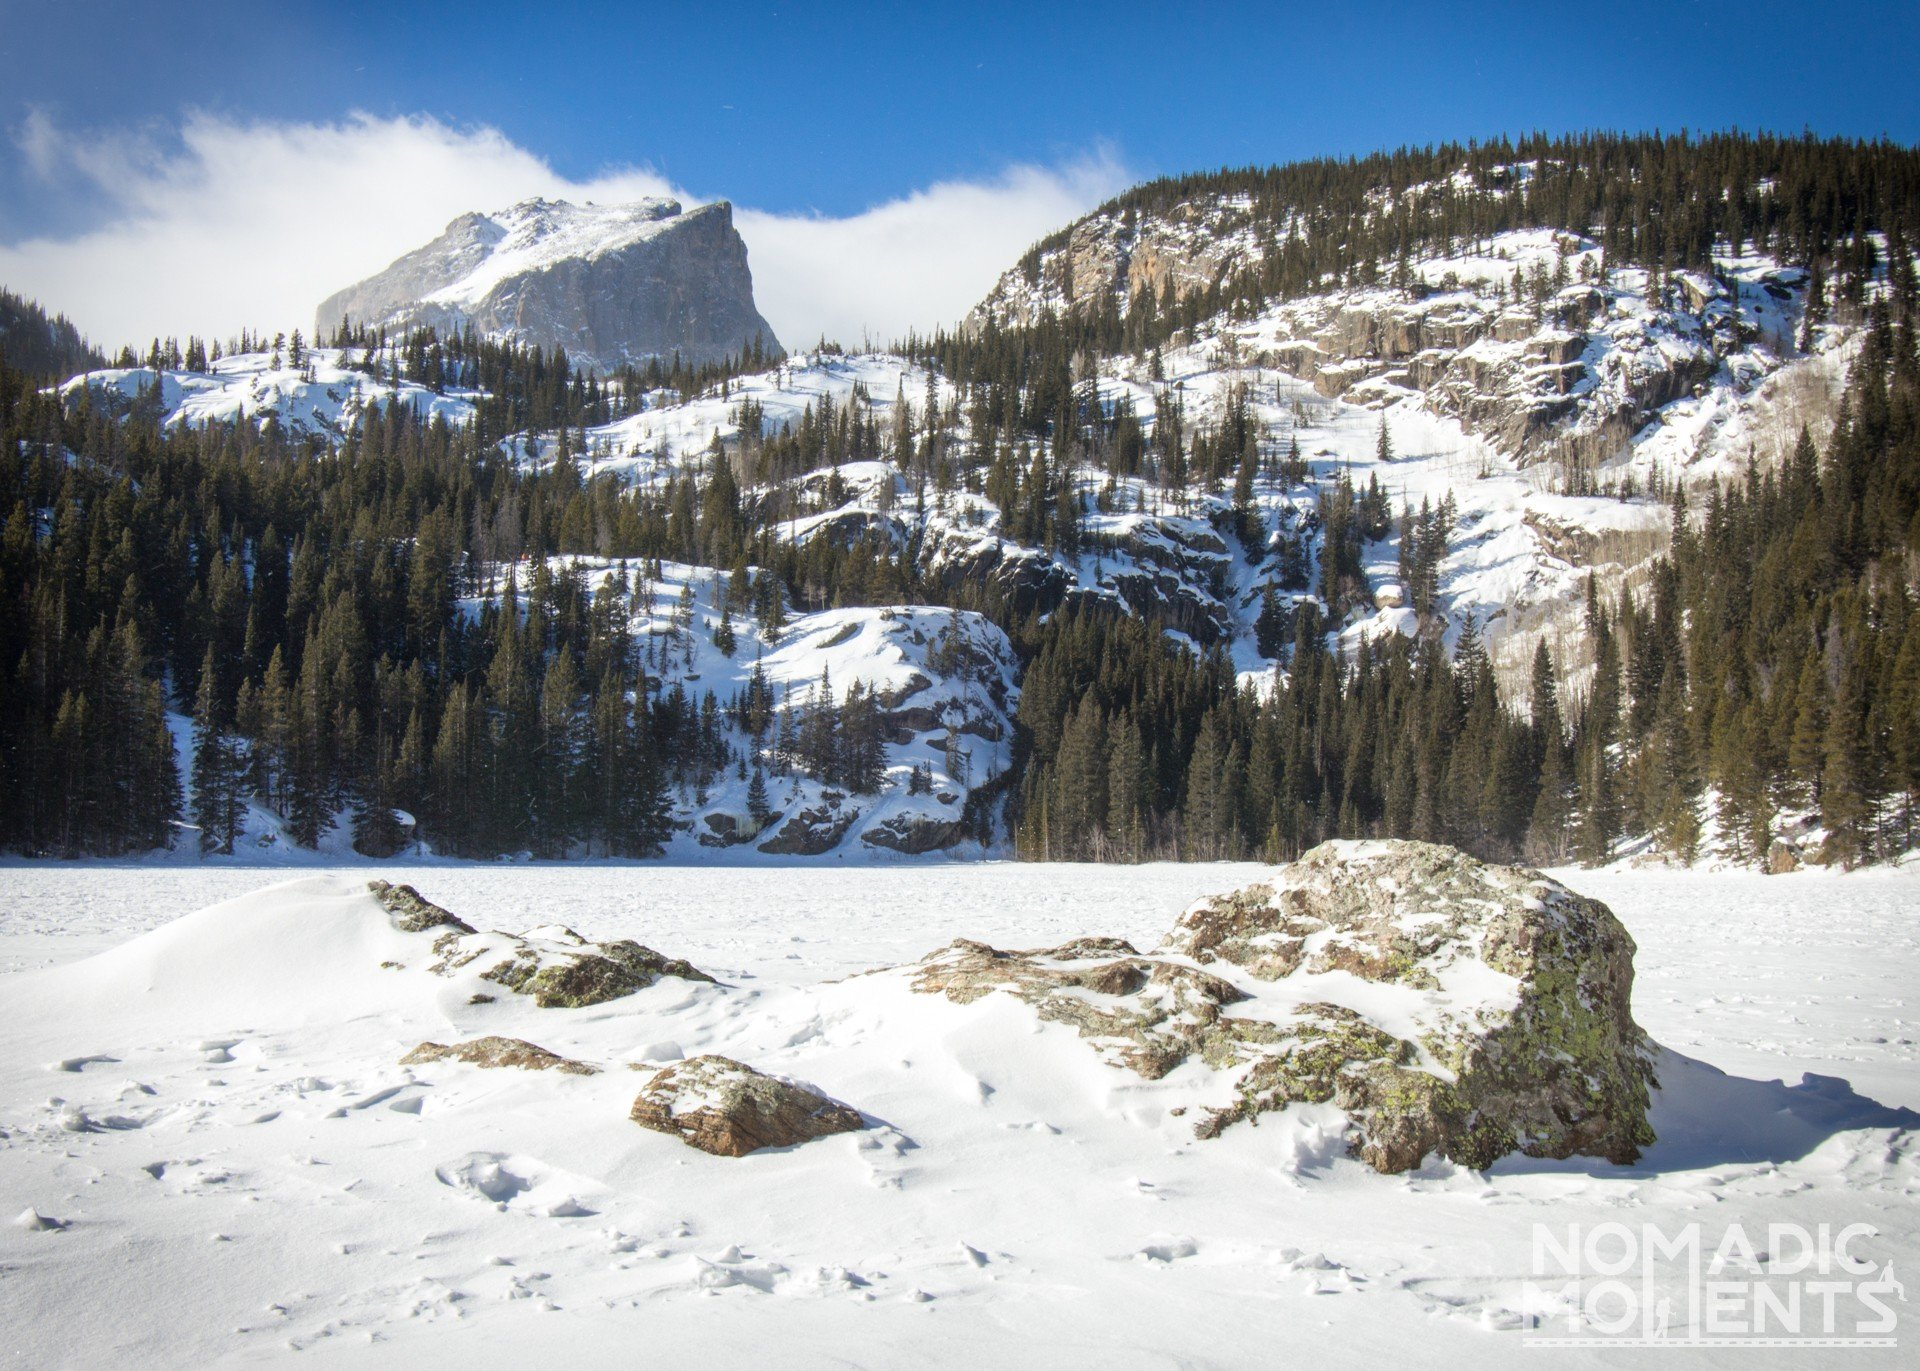 Rocky Mountain National Park's Bear Lake in winter.